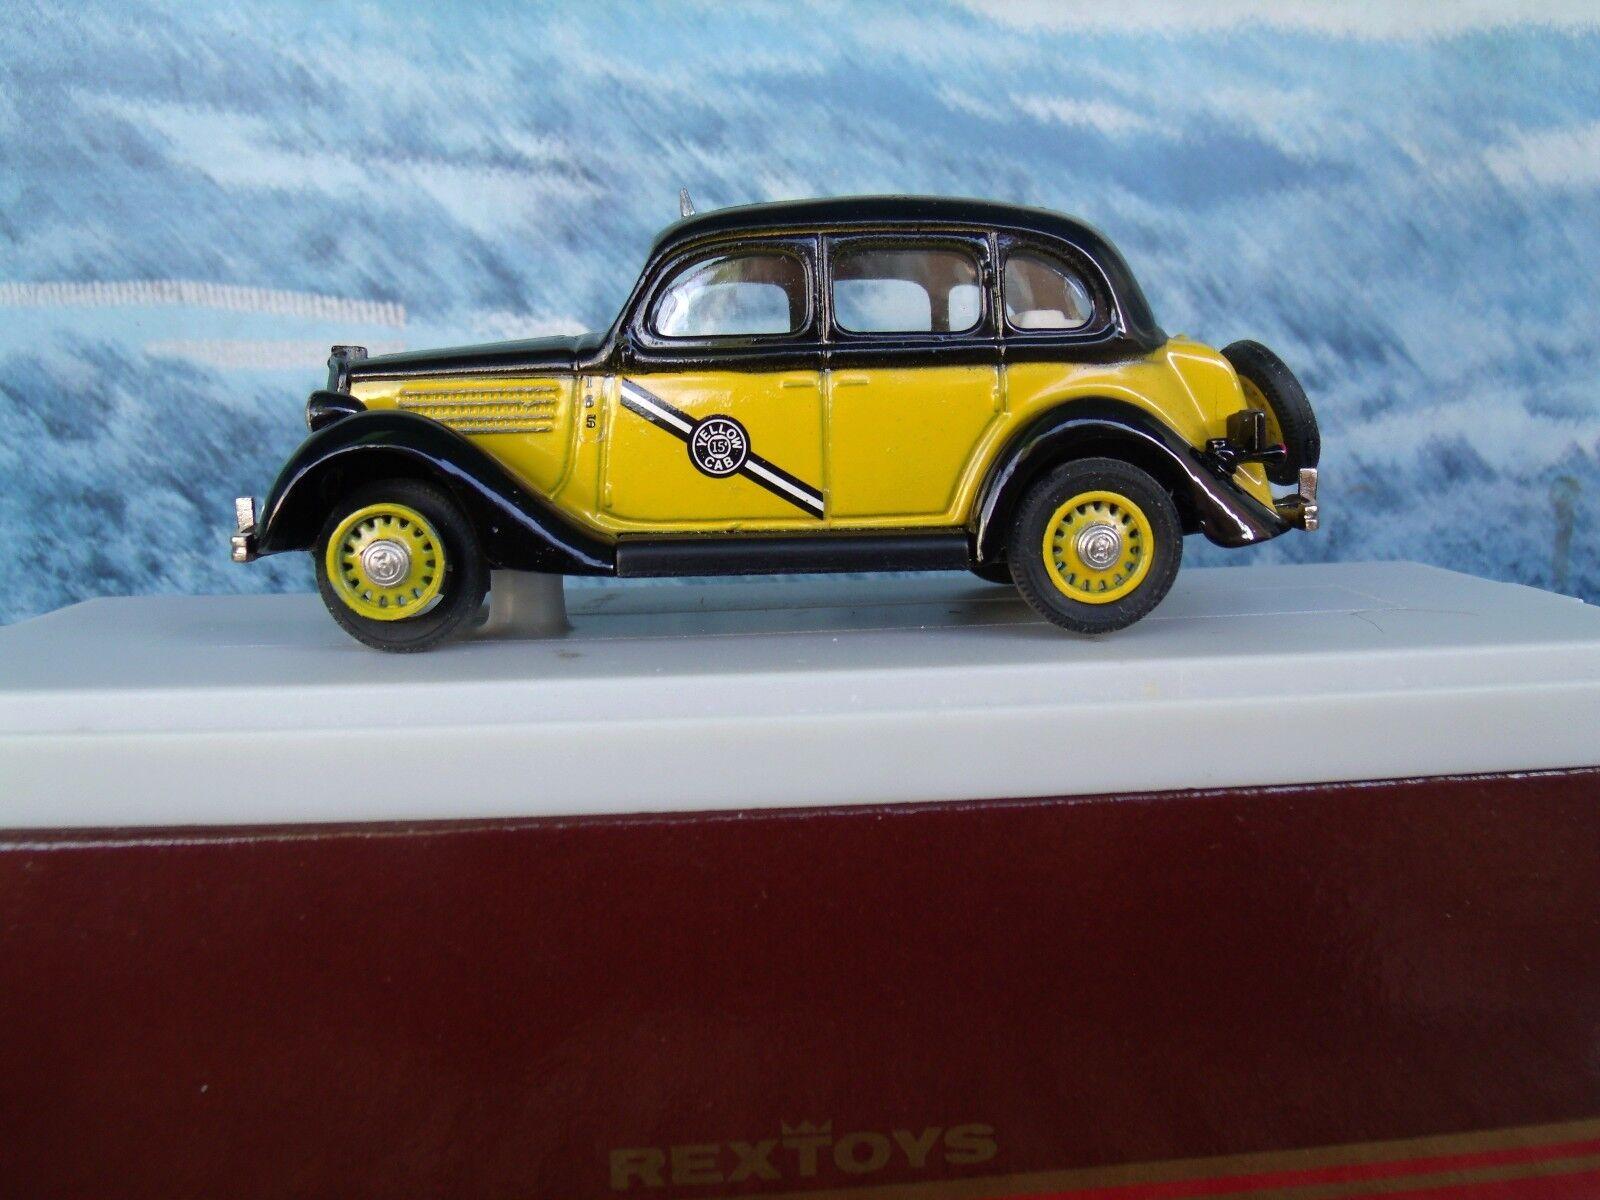 1 43  Rextoys Ford 1935  Taxi